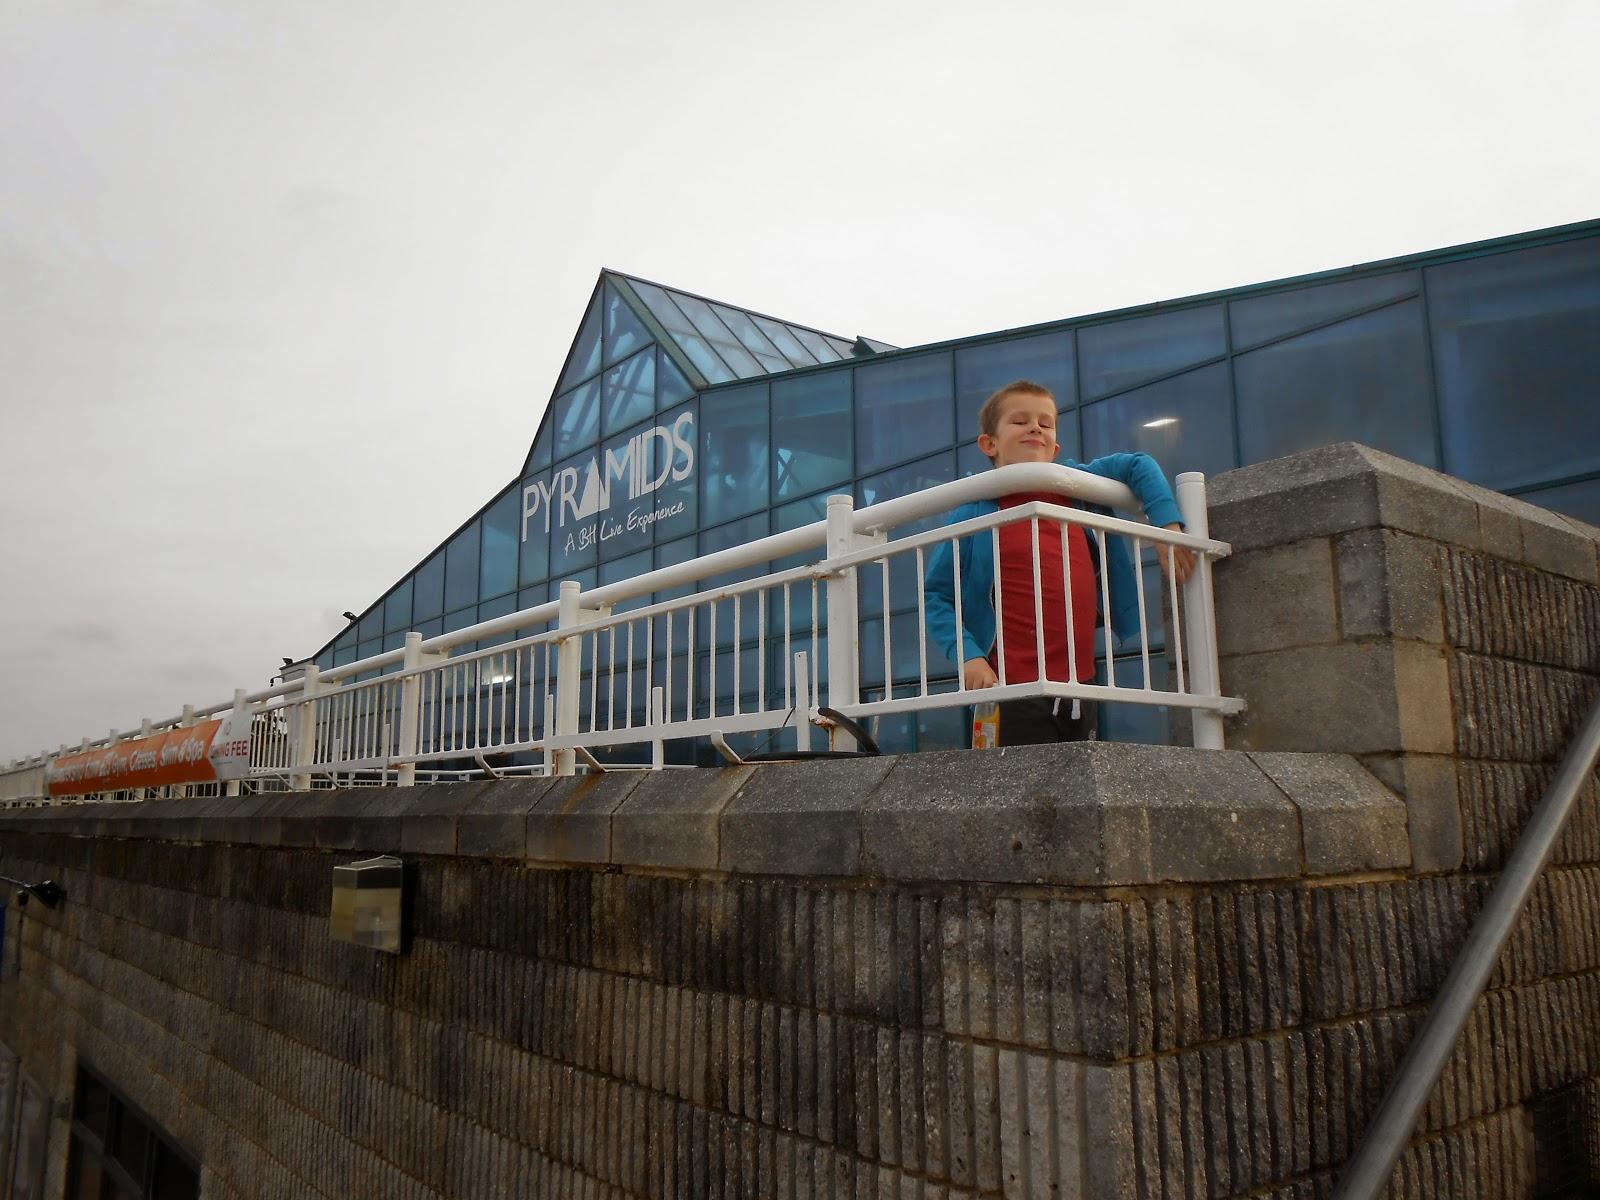 Professor mungleton december 2014 for Pyramid swimming pool portsmouth